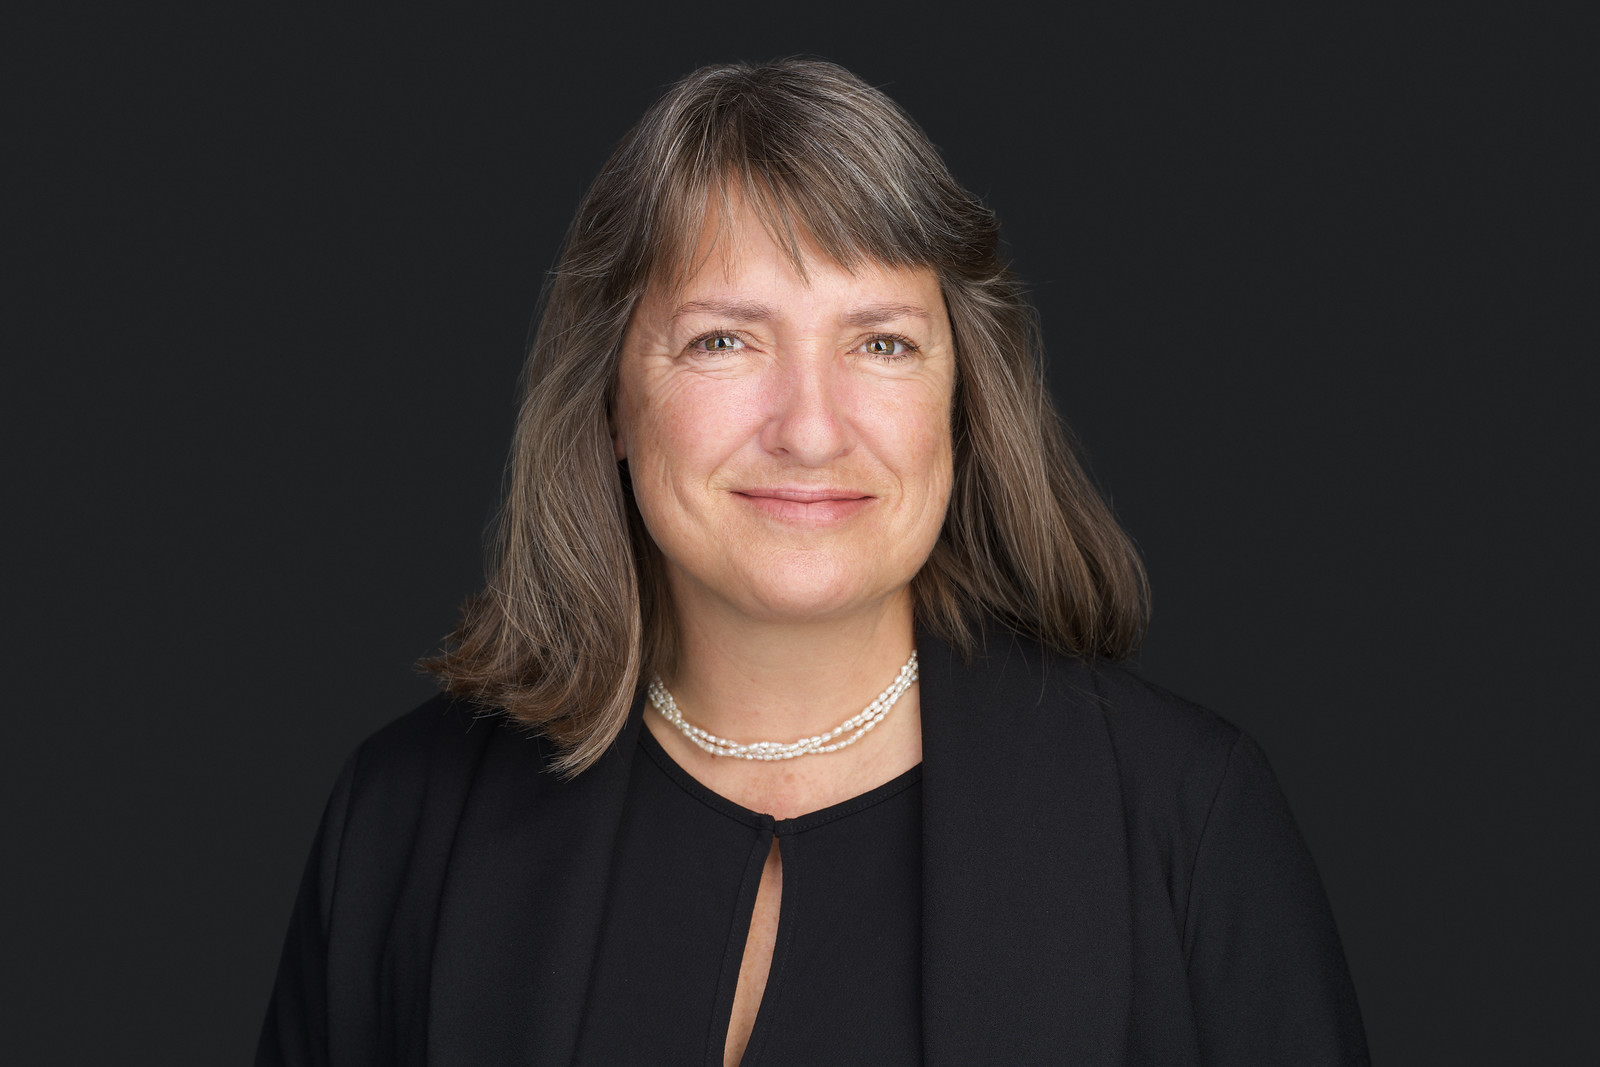 Nathalie Lamothe